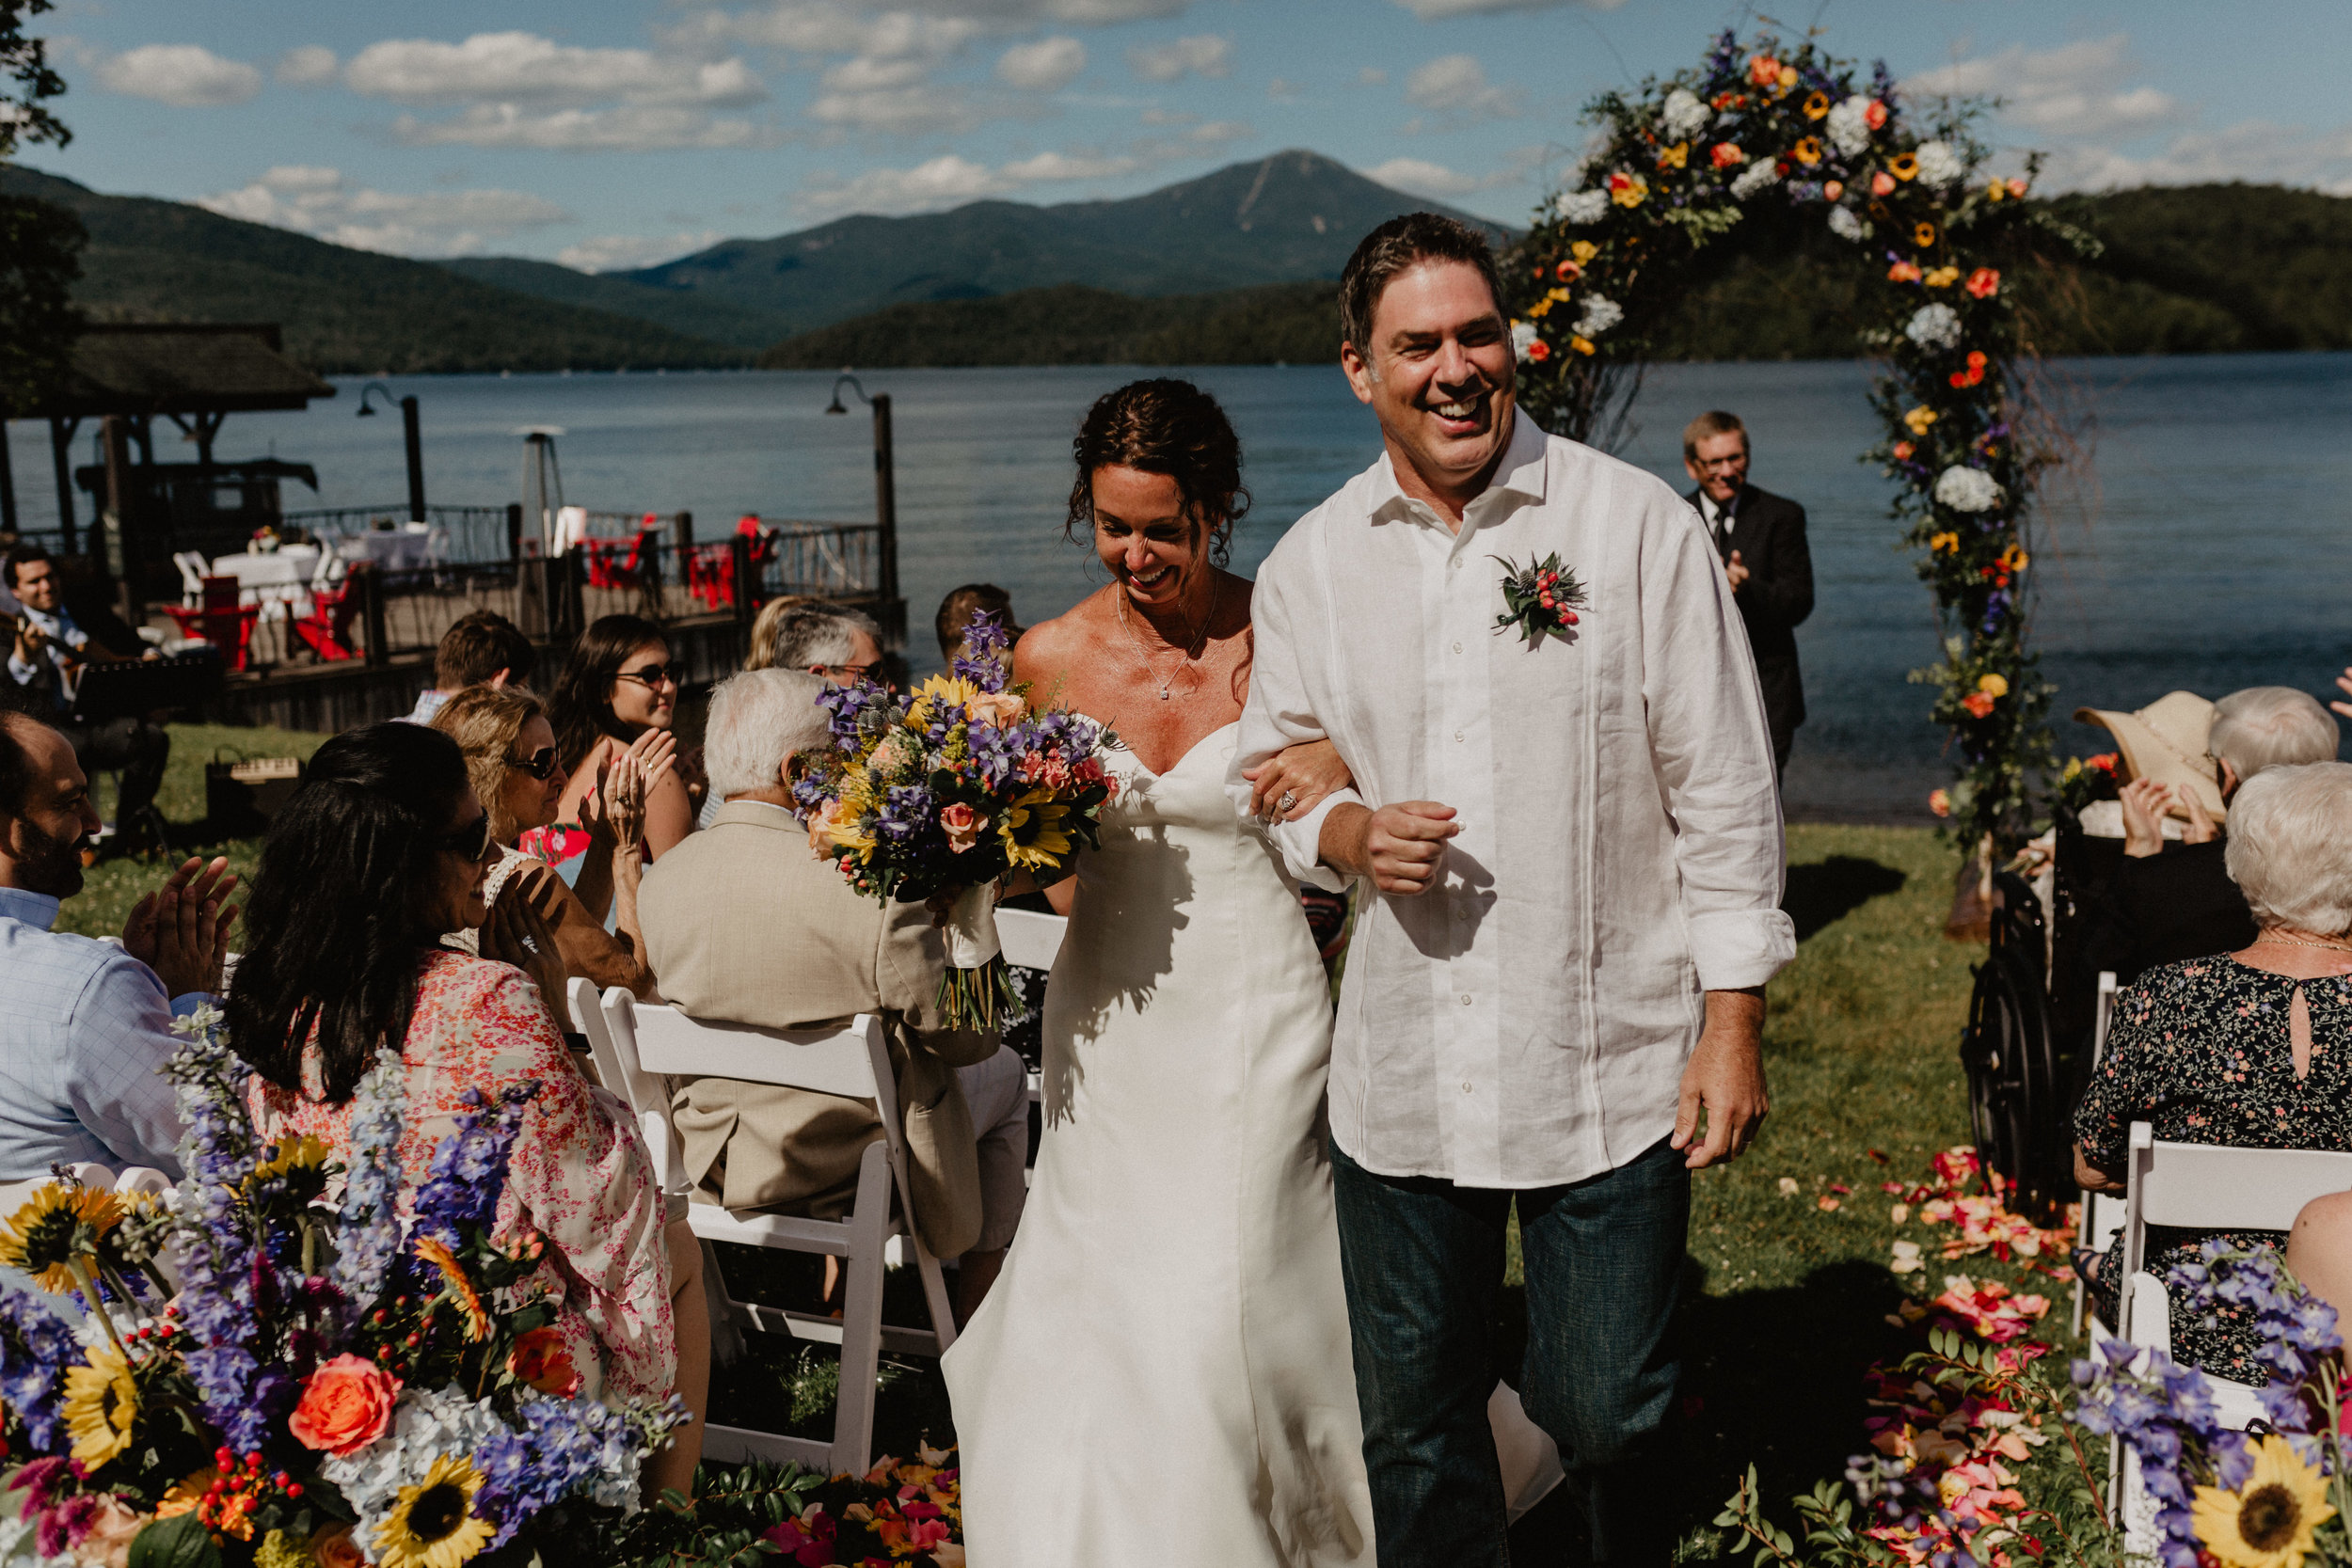 lake_placid_lodge_wedding_022.jpg